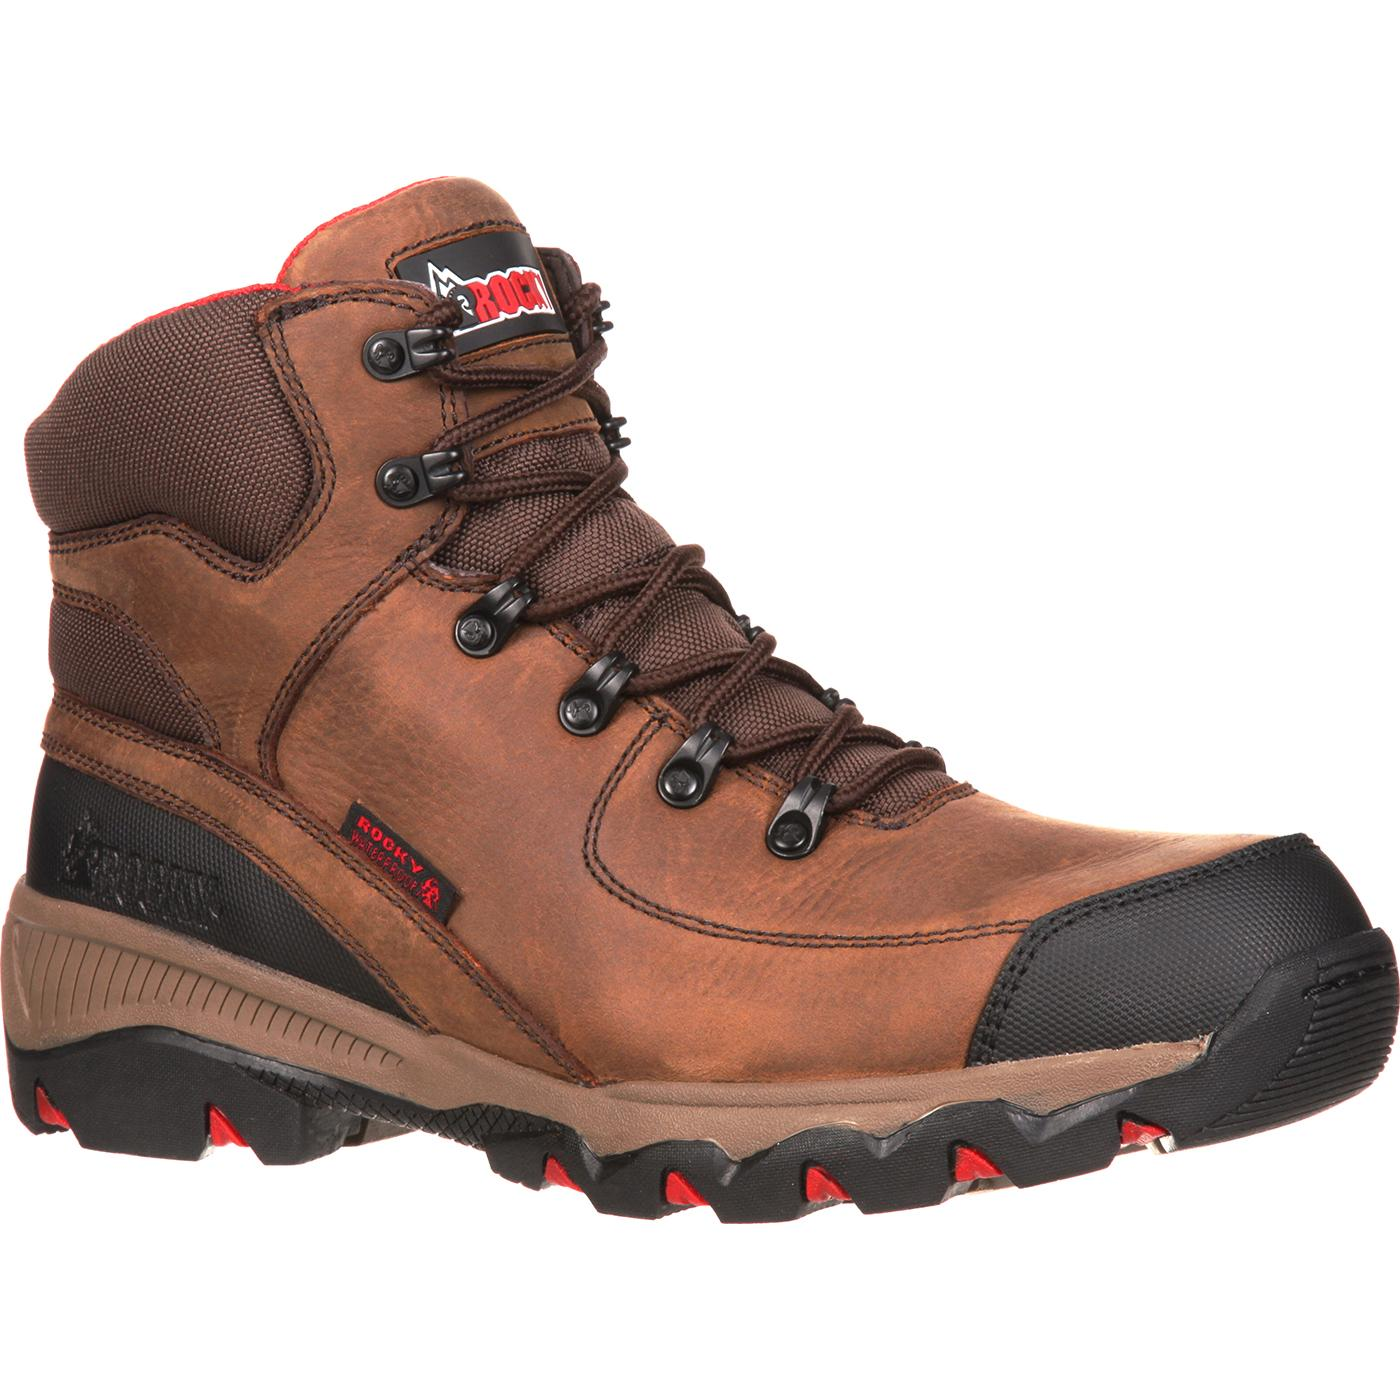 Men's Rocky Composite Toe Waterproof Work Boots RKYK102